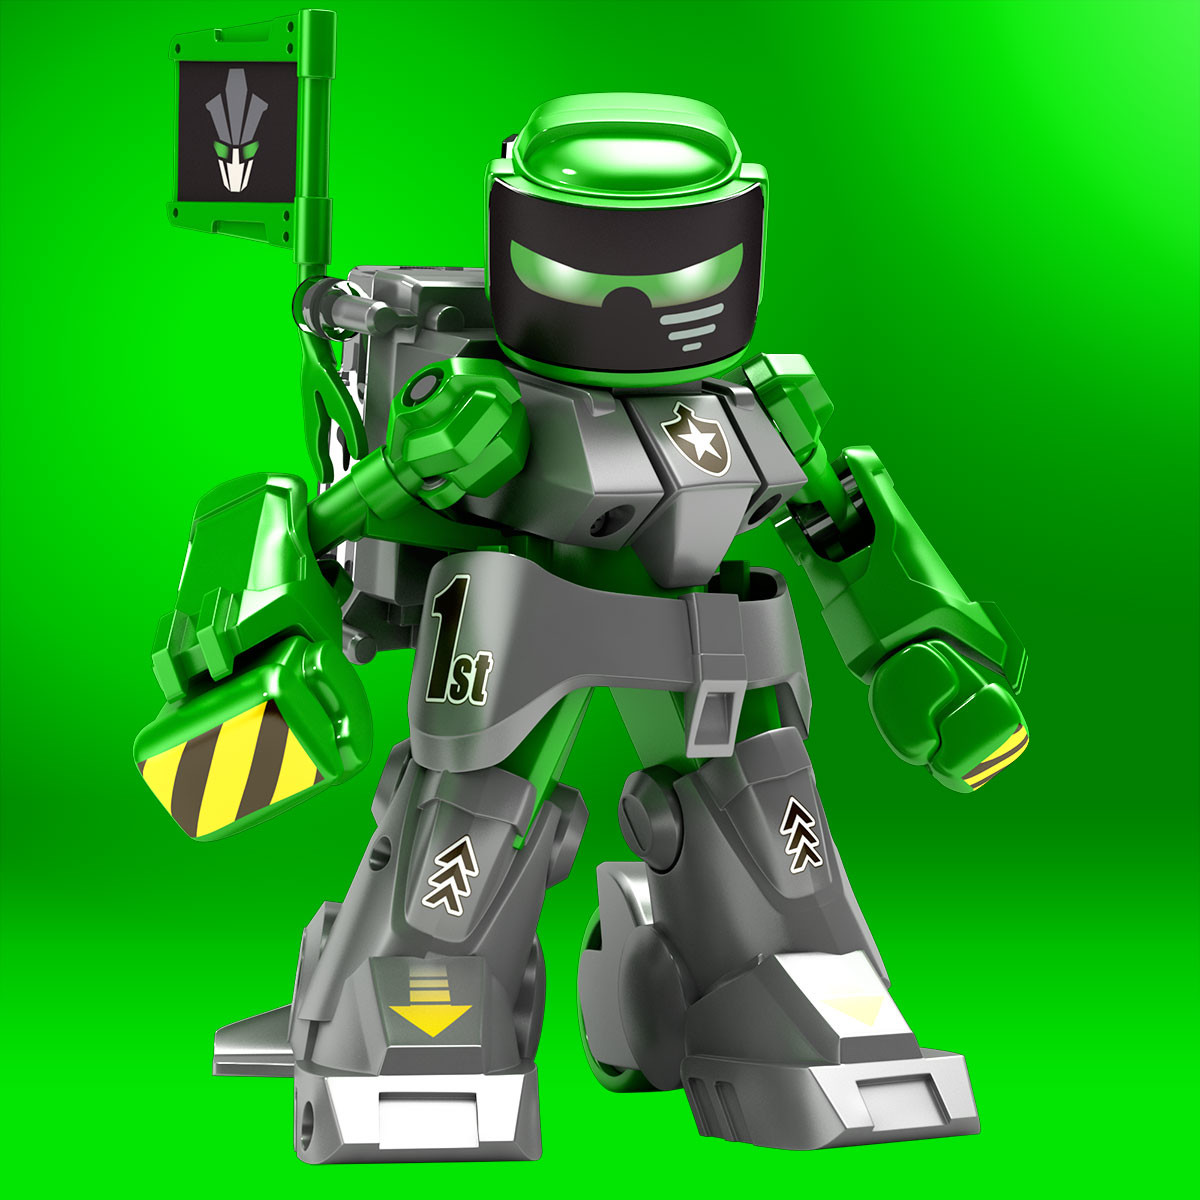 Battroborg Battling Robots